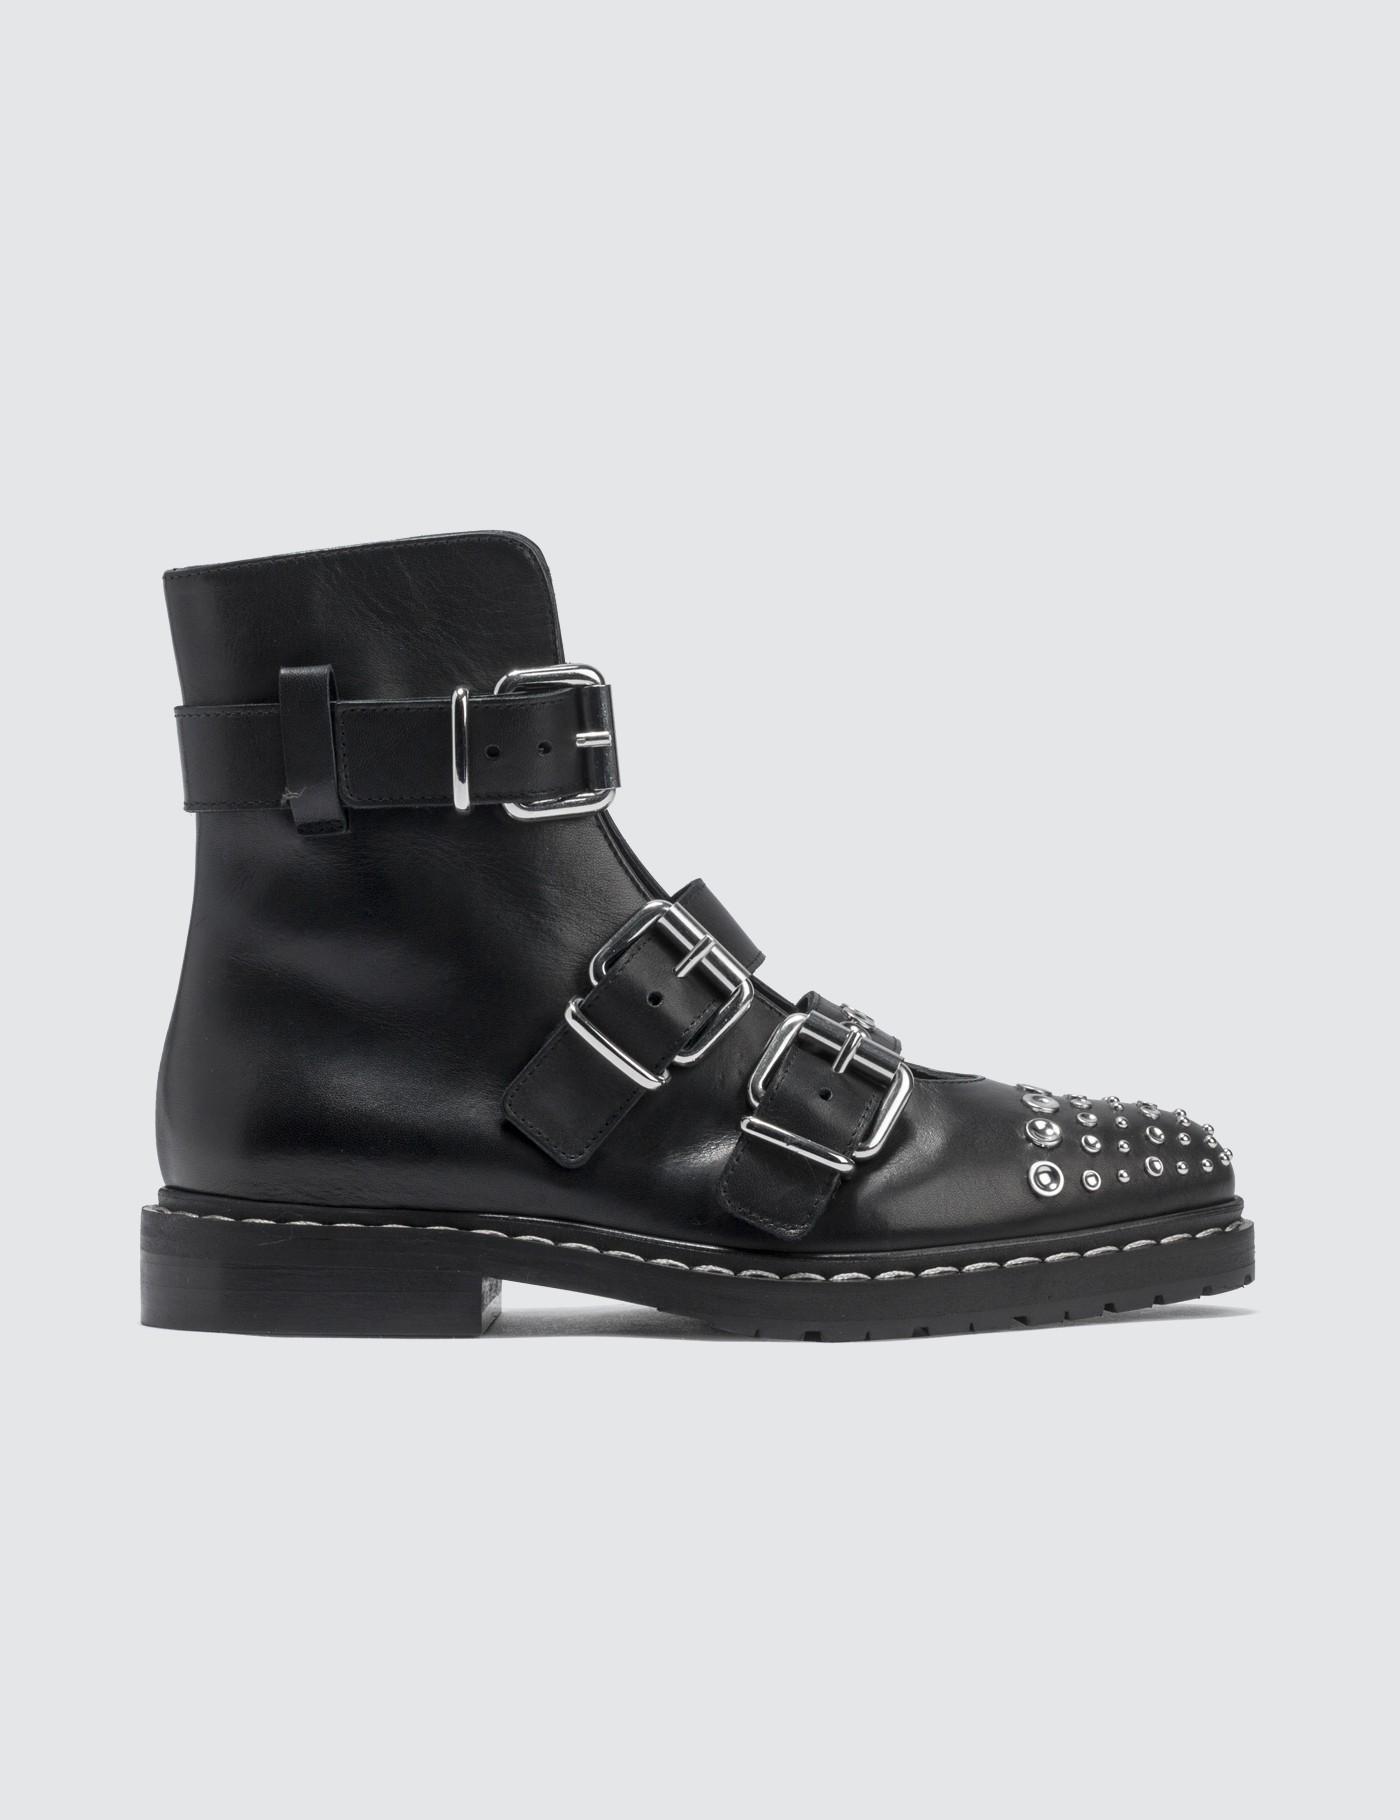 cbd1095e9618 Lyst - McQ Fate Boots in Black